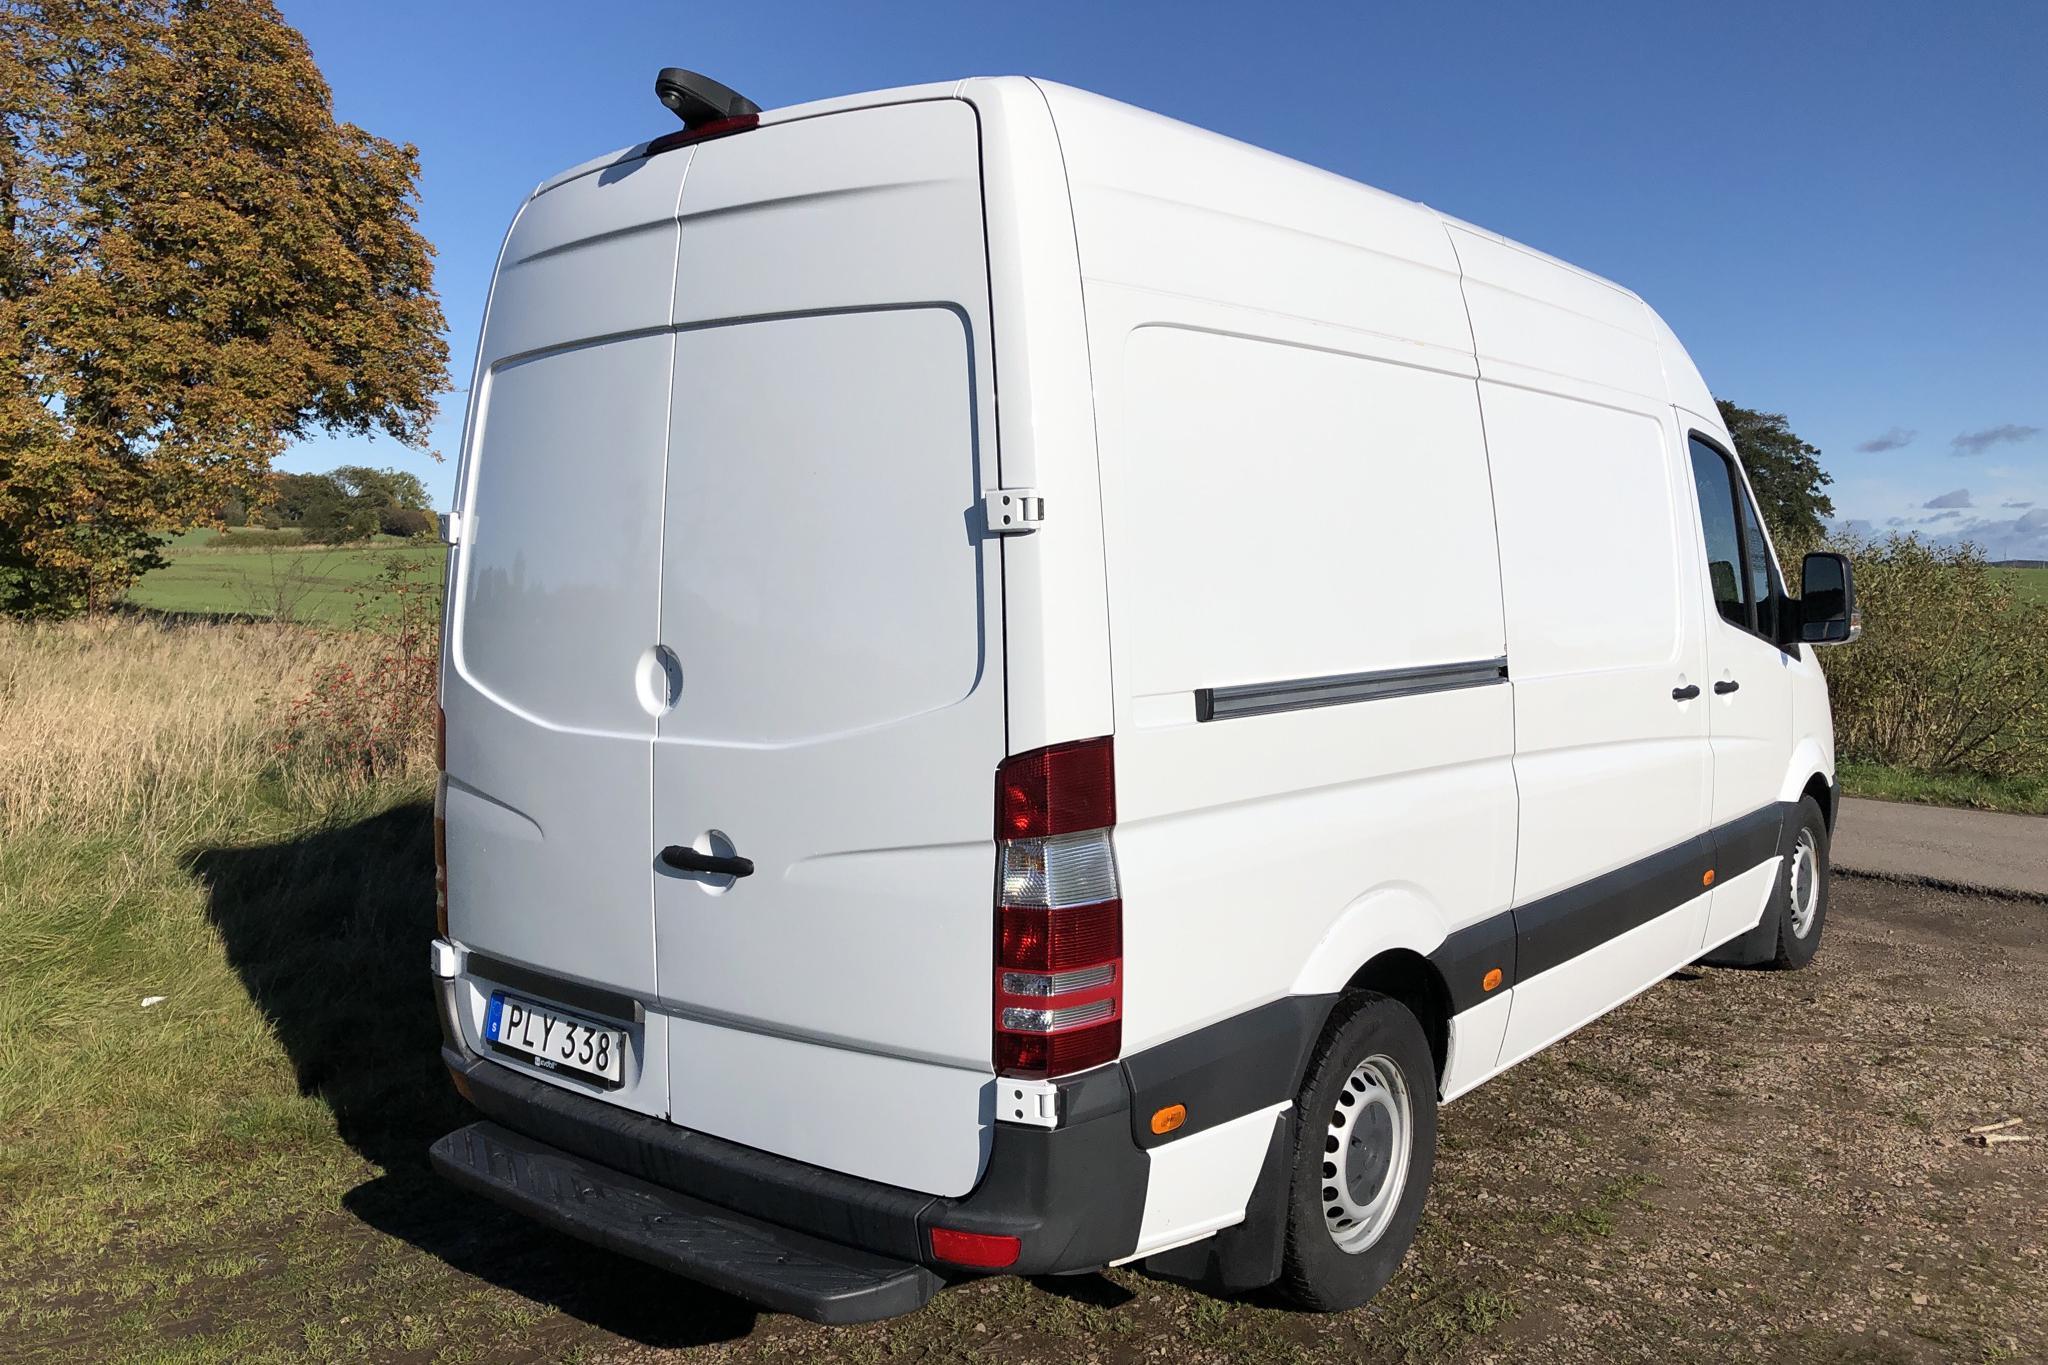 Mercedes Sprinter 316 CDI (163hk) - 146 290 km - Automatic - white - 2017